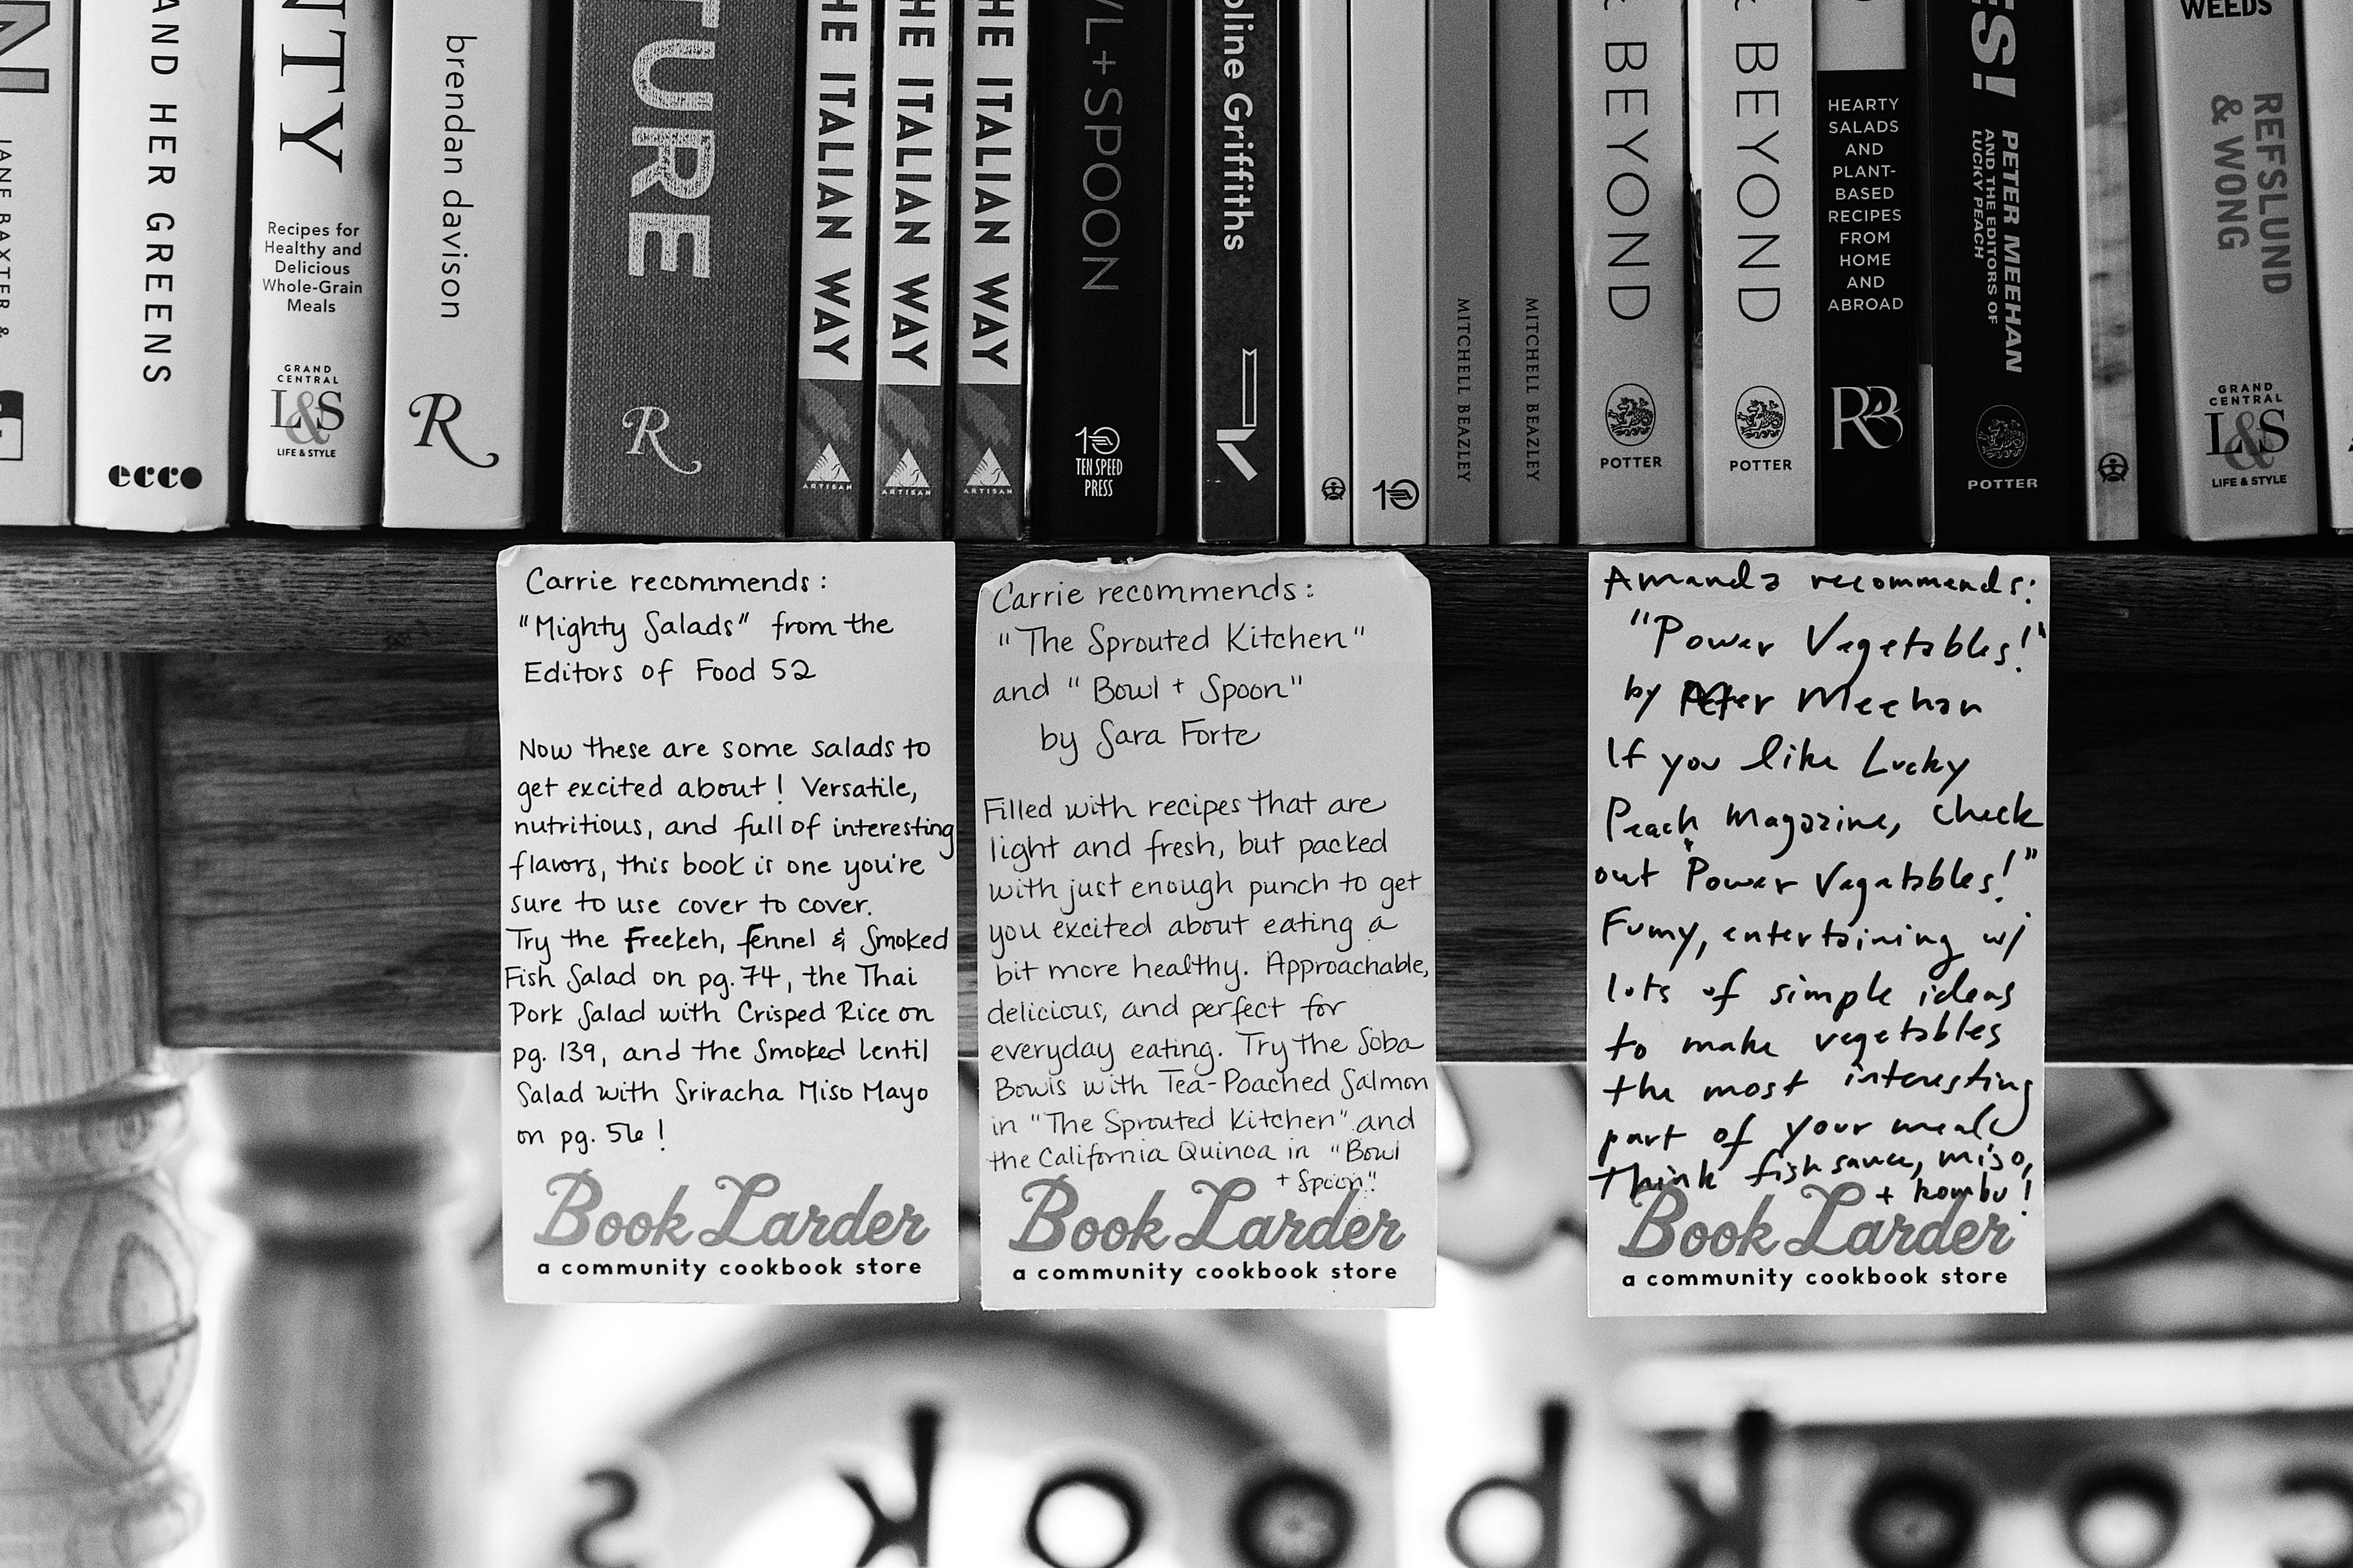 seattle-book-larder-cookbook-store-notes